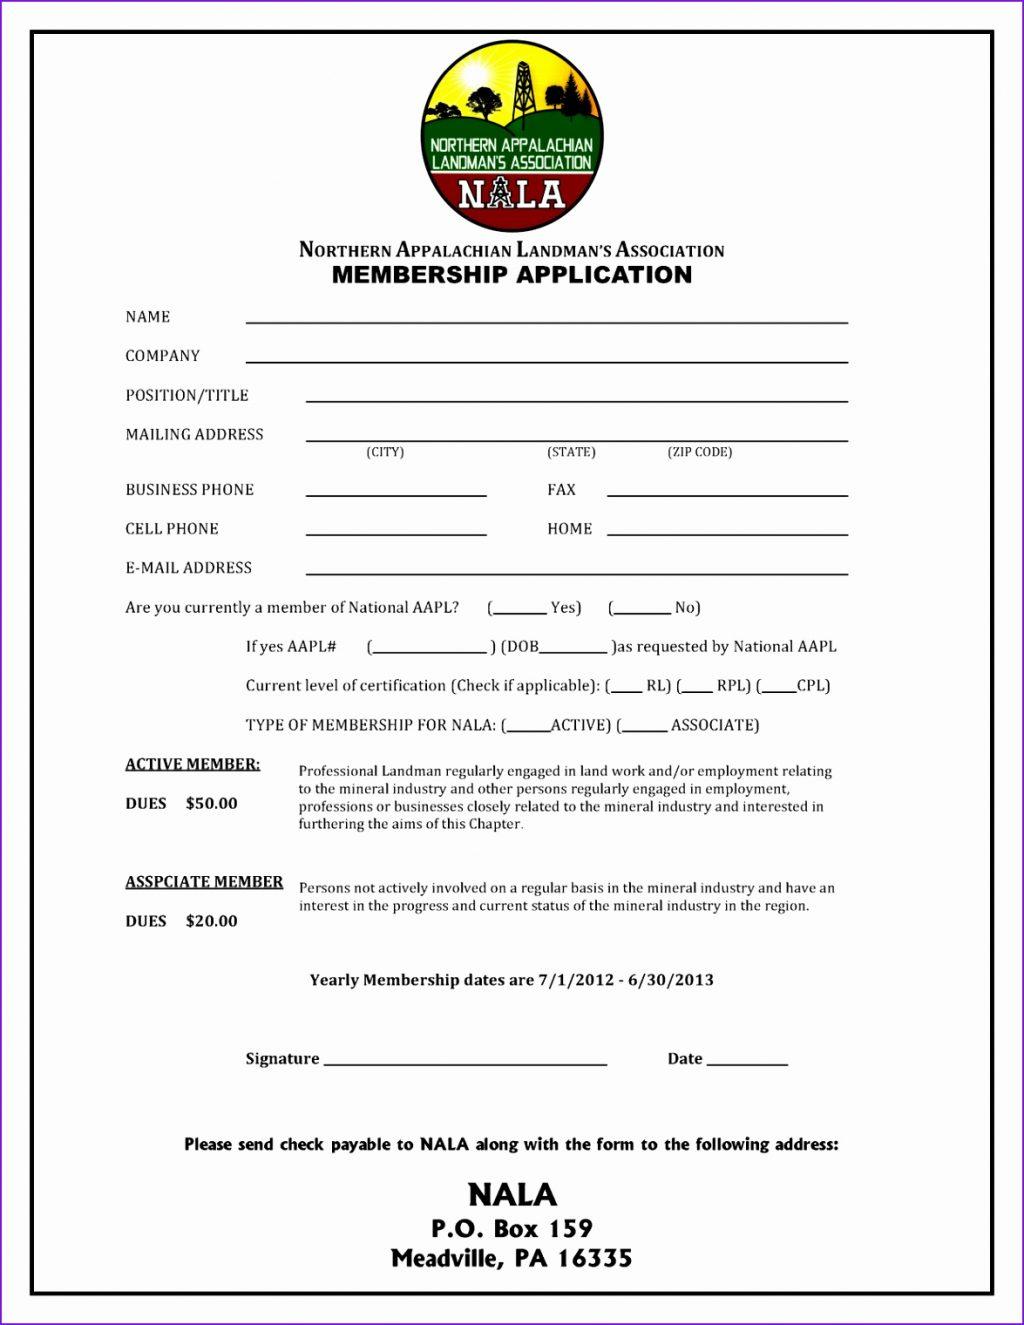 Membership Form Sample Pdf 14 Signs You Re In Love With Membership Form Sample Pdf Signs Youre In Love Business Card Template Design Membership Card